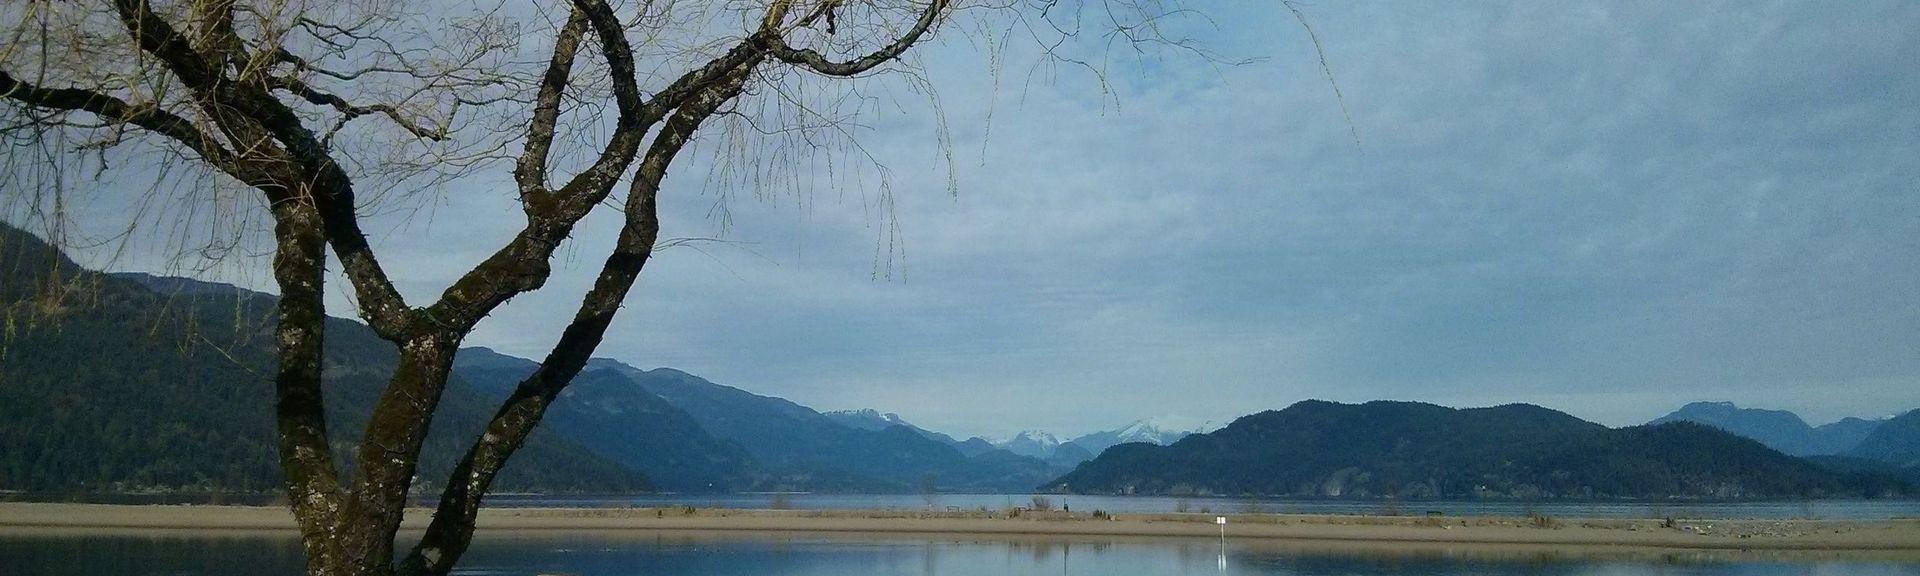 Cultus Lake Park, Chilliwack, British Columbia, Canada